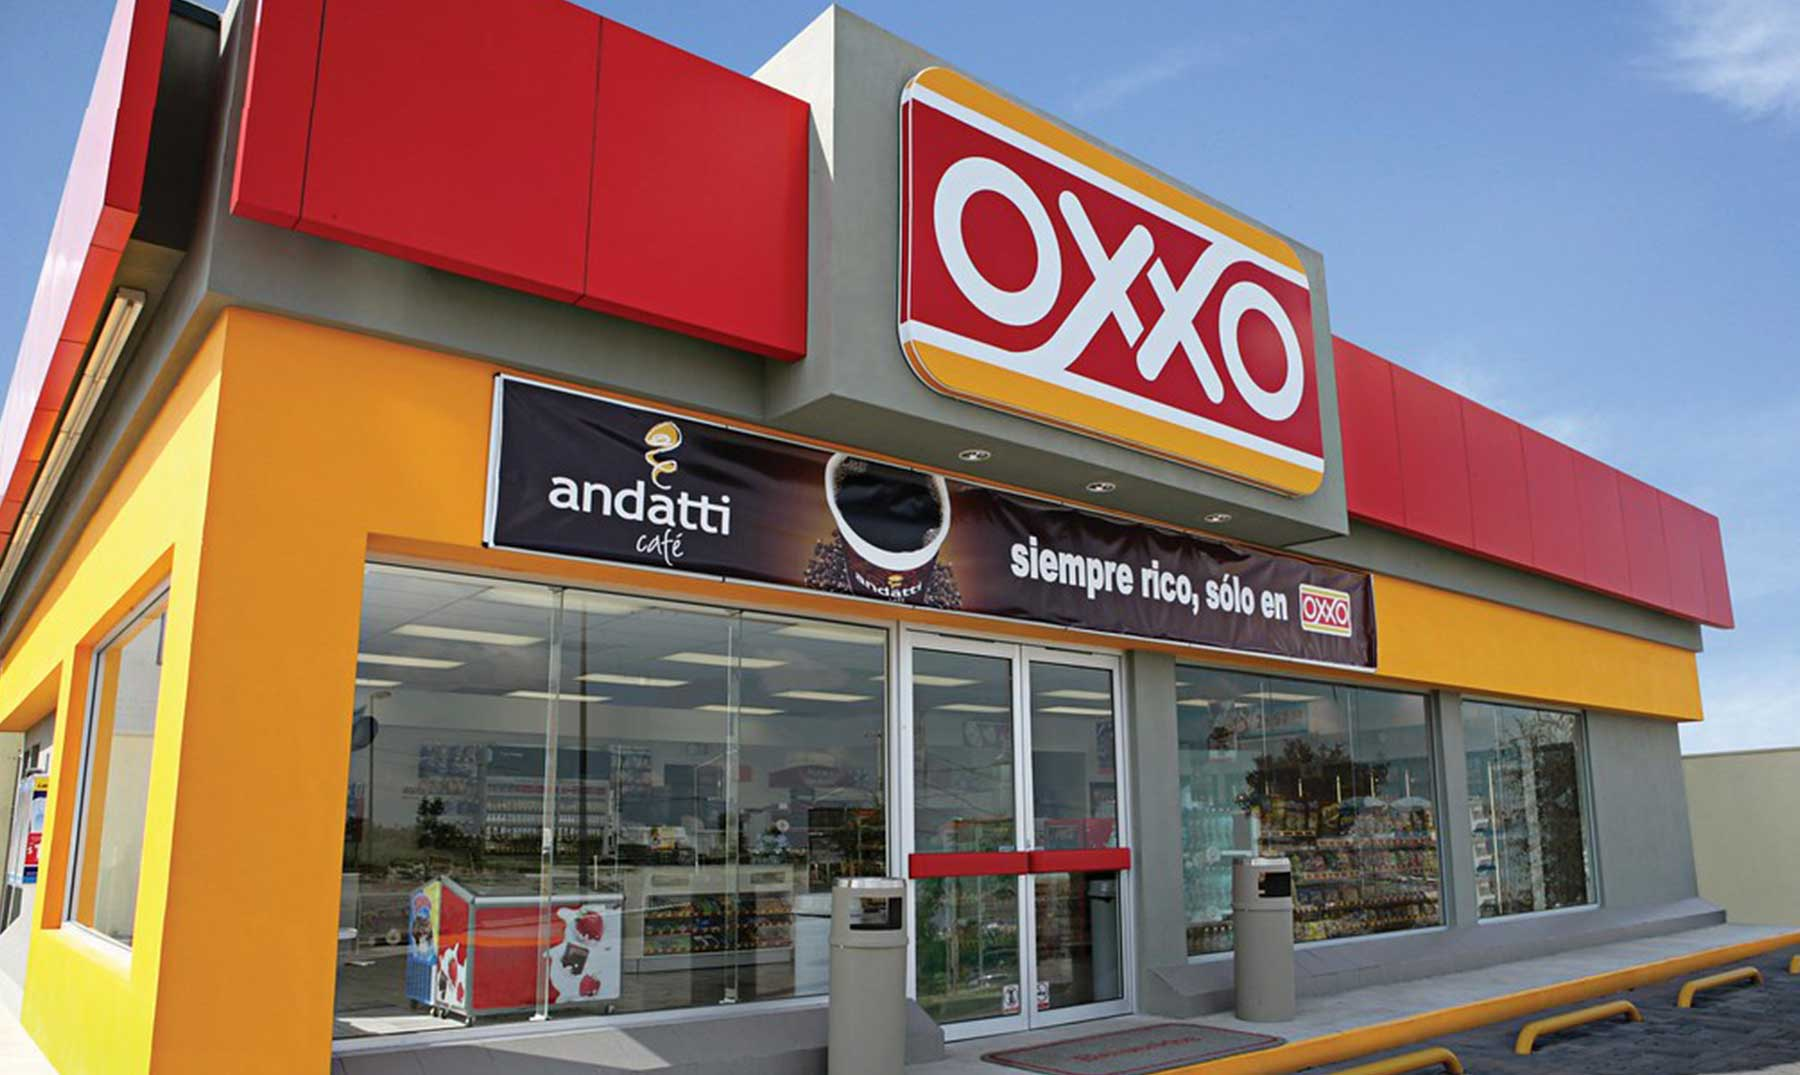 vista-frontal-tienda-oxxo